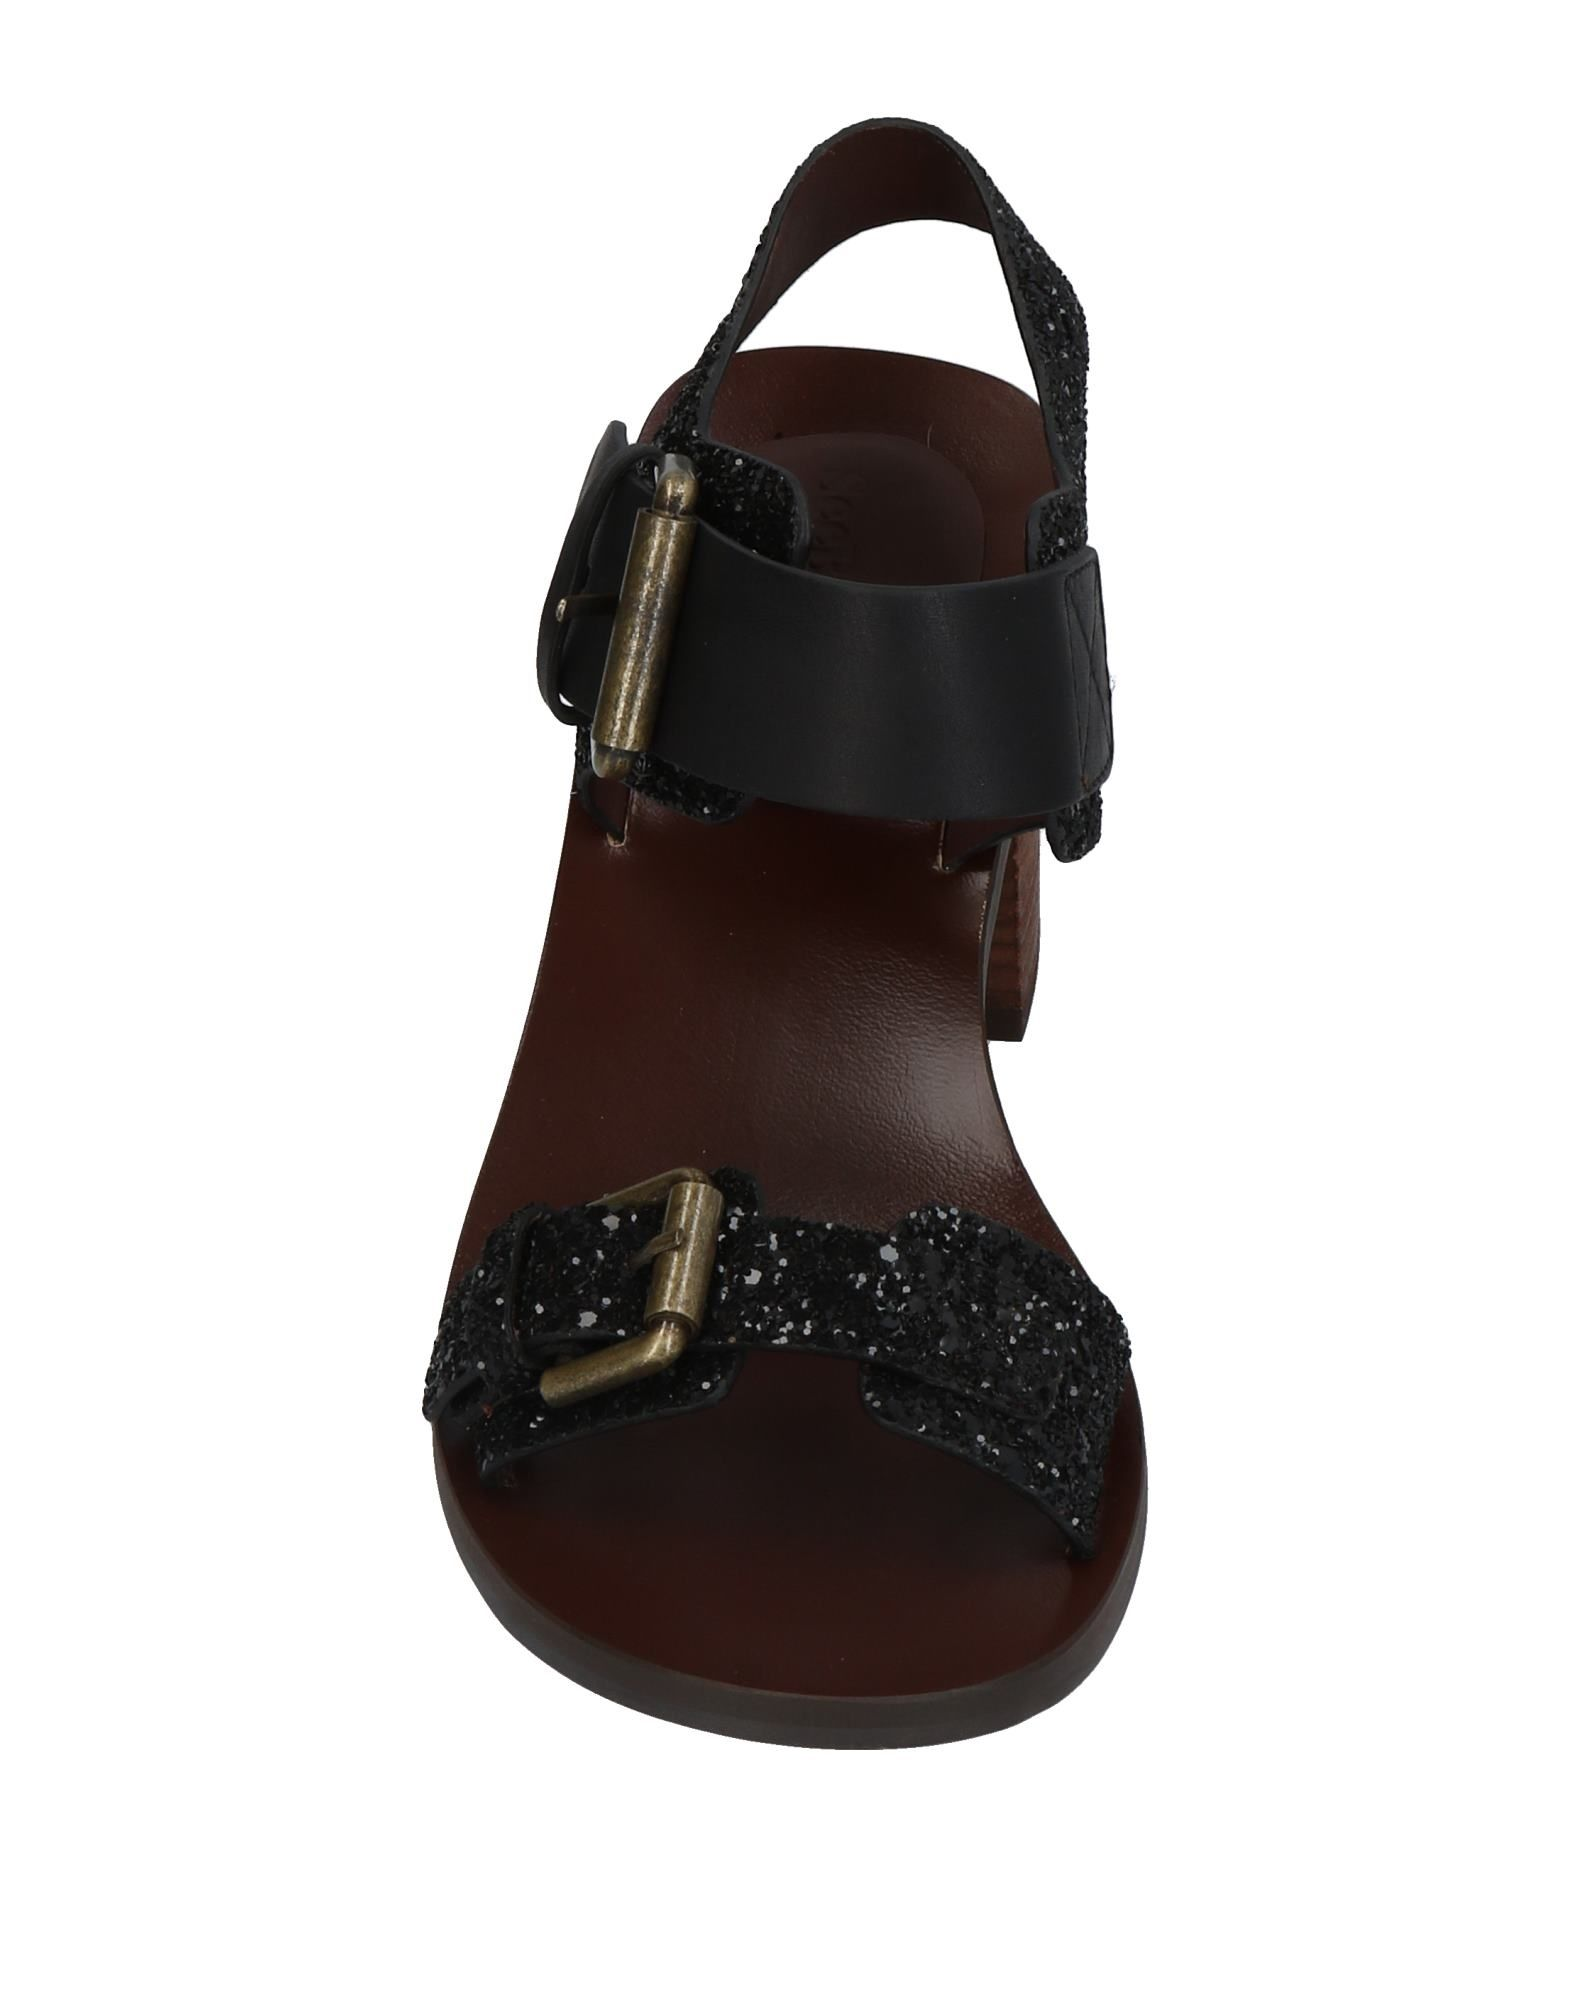 Stilvolle Chloé billige Schuhe See By Chloé Stilvolle Sandalen Damen  11424349UA 35b362